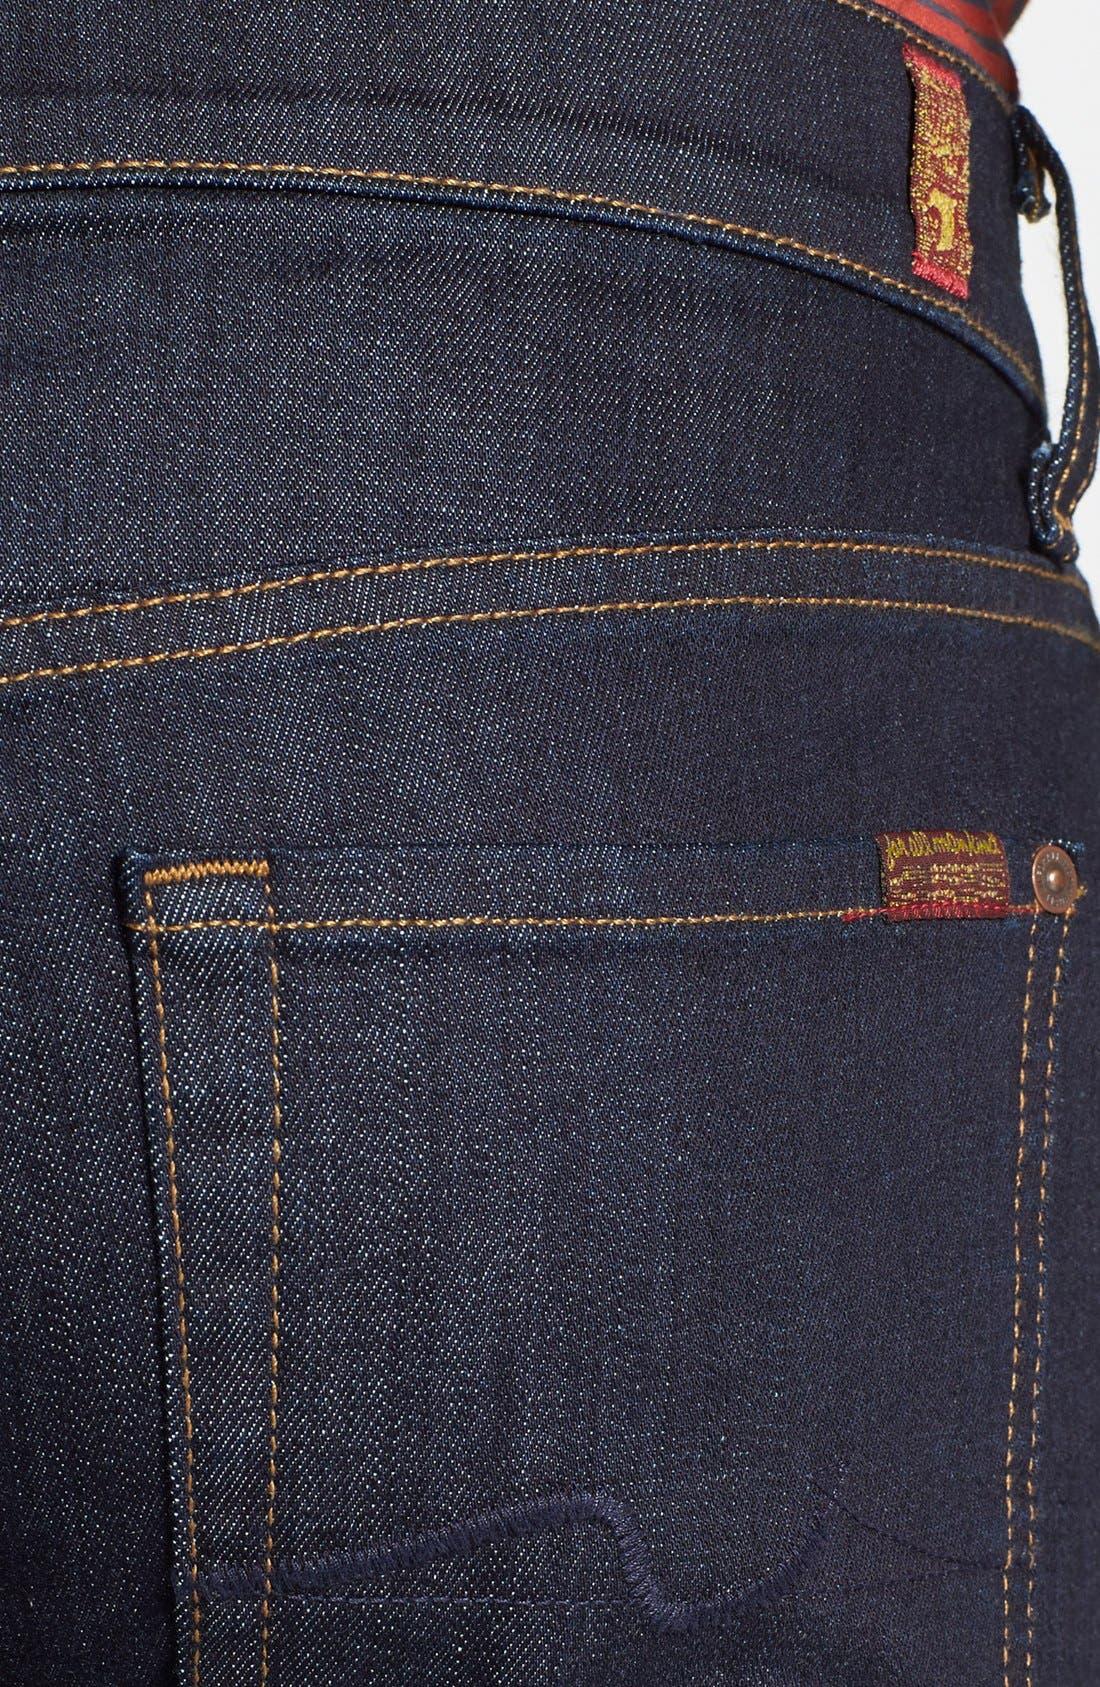 'Slimmy' Slim Fit Jeans,                             Alternate thumbnail 6, color,                             DARK & CLEAN